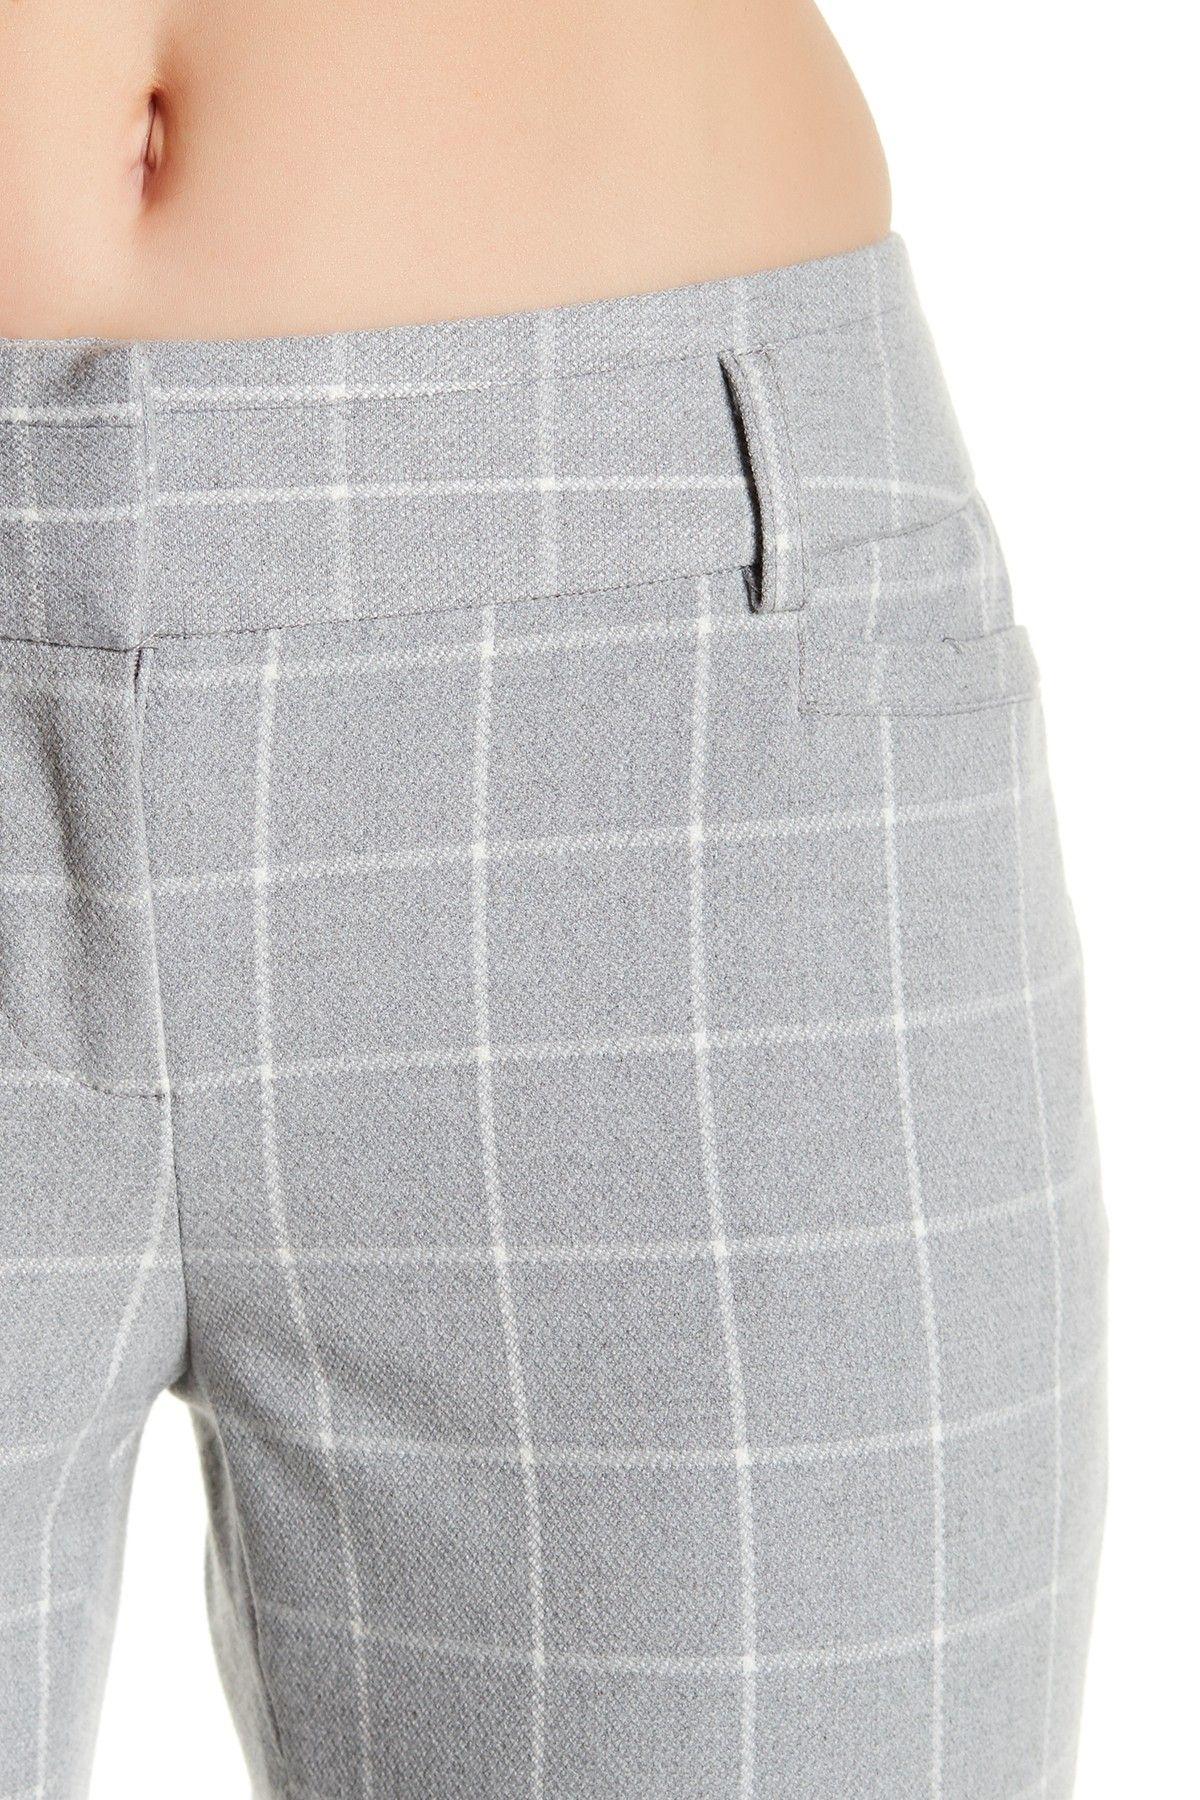 Plaid Notch Back Pant by Amanda & Chelsea on @nordstrom_rack